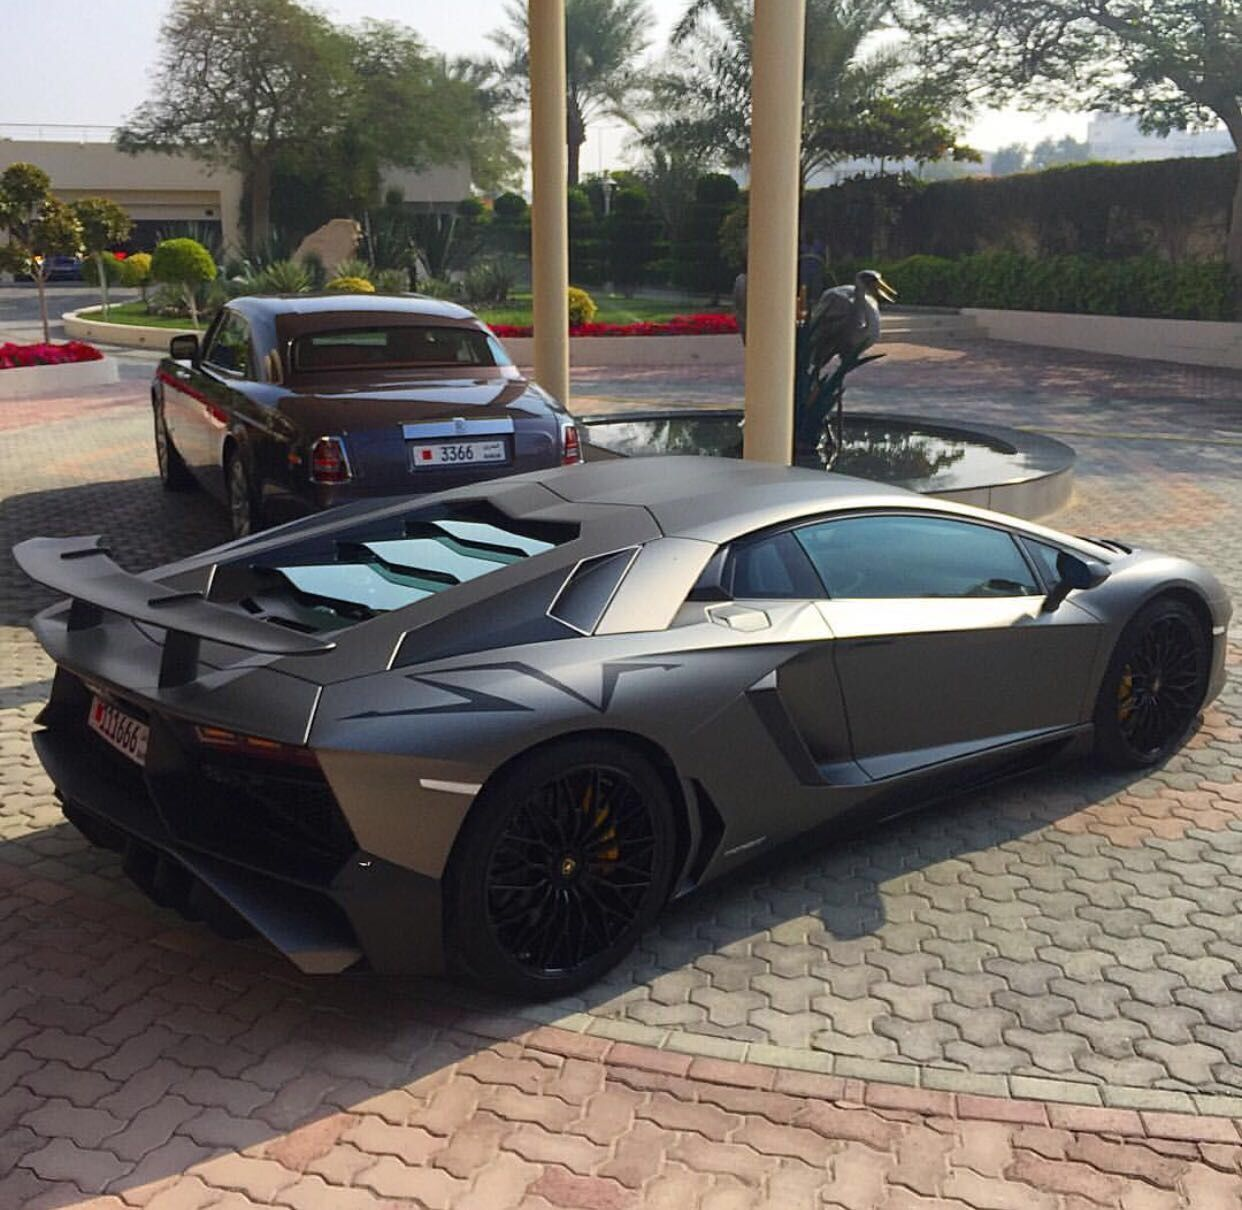 fσℓℓσω мє blackgirljoy Luxury cars, cars